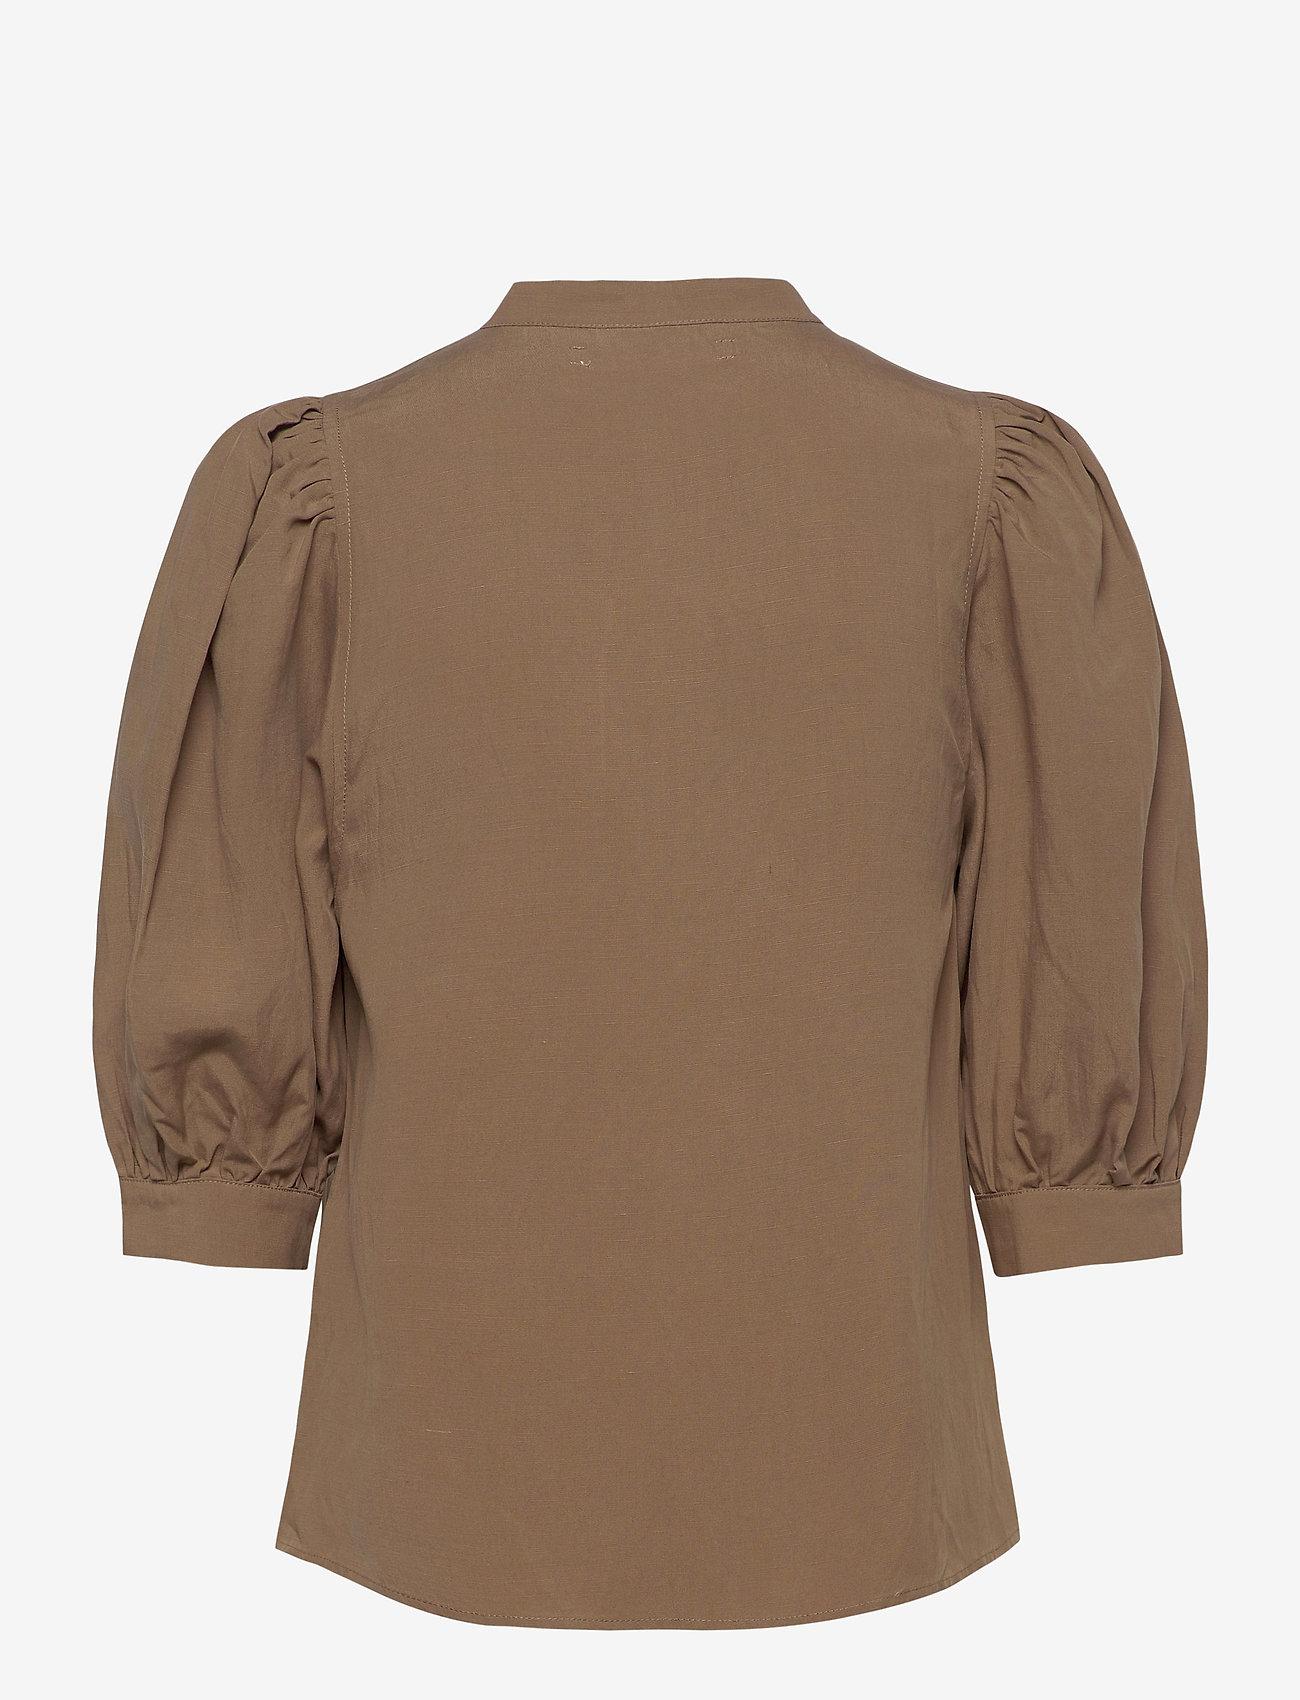 Samsøe Samsøe - Mejse shirt 12771 - denimskjorter - caribou - 1